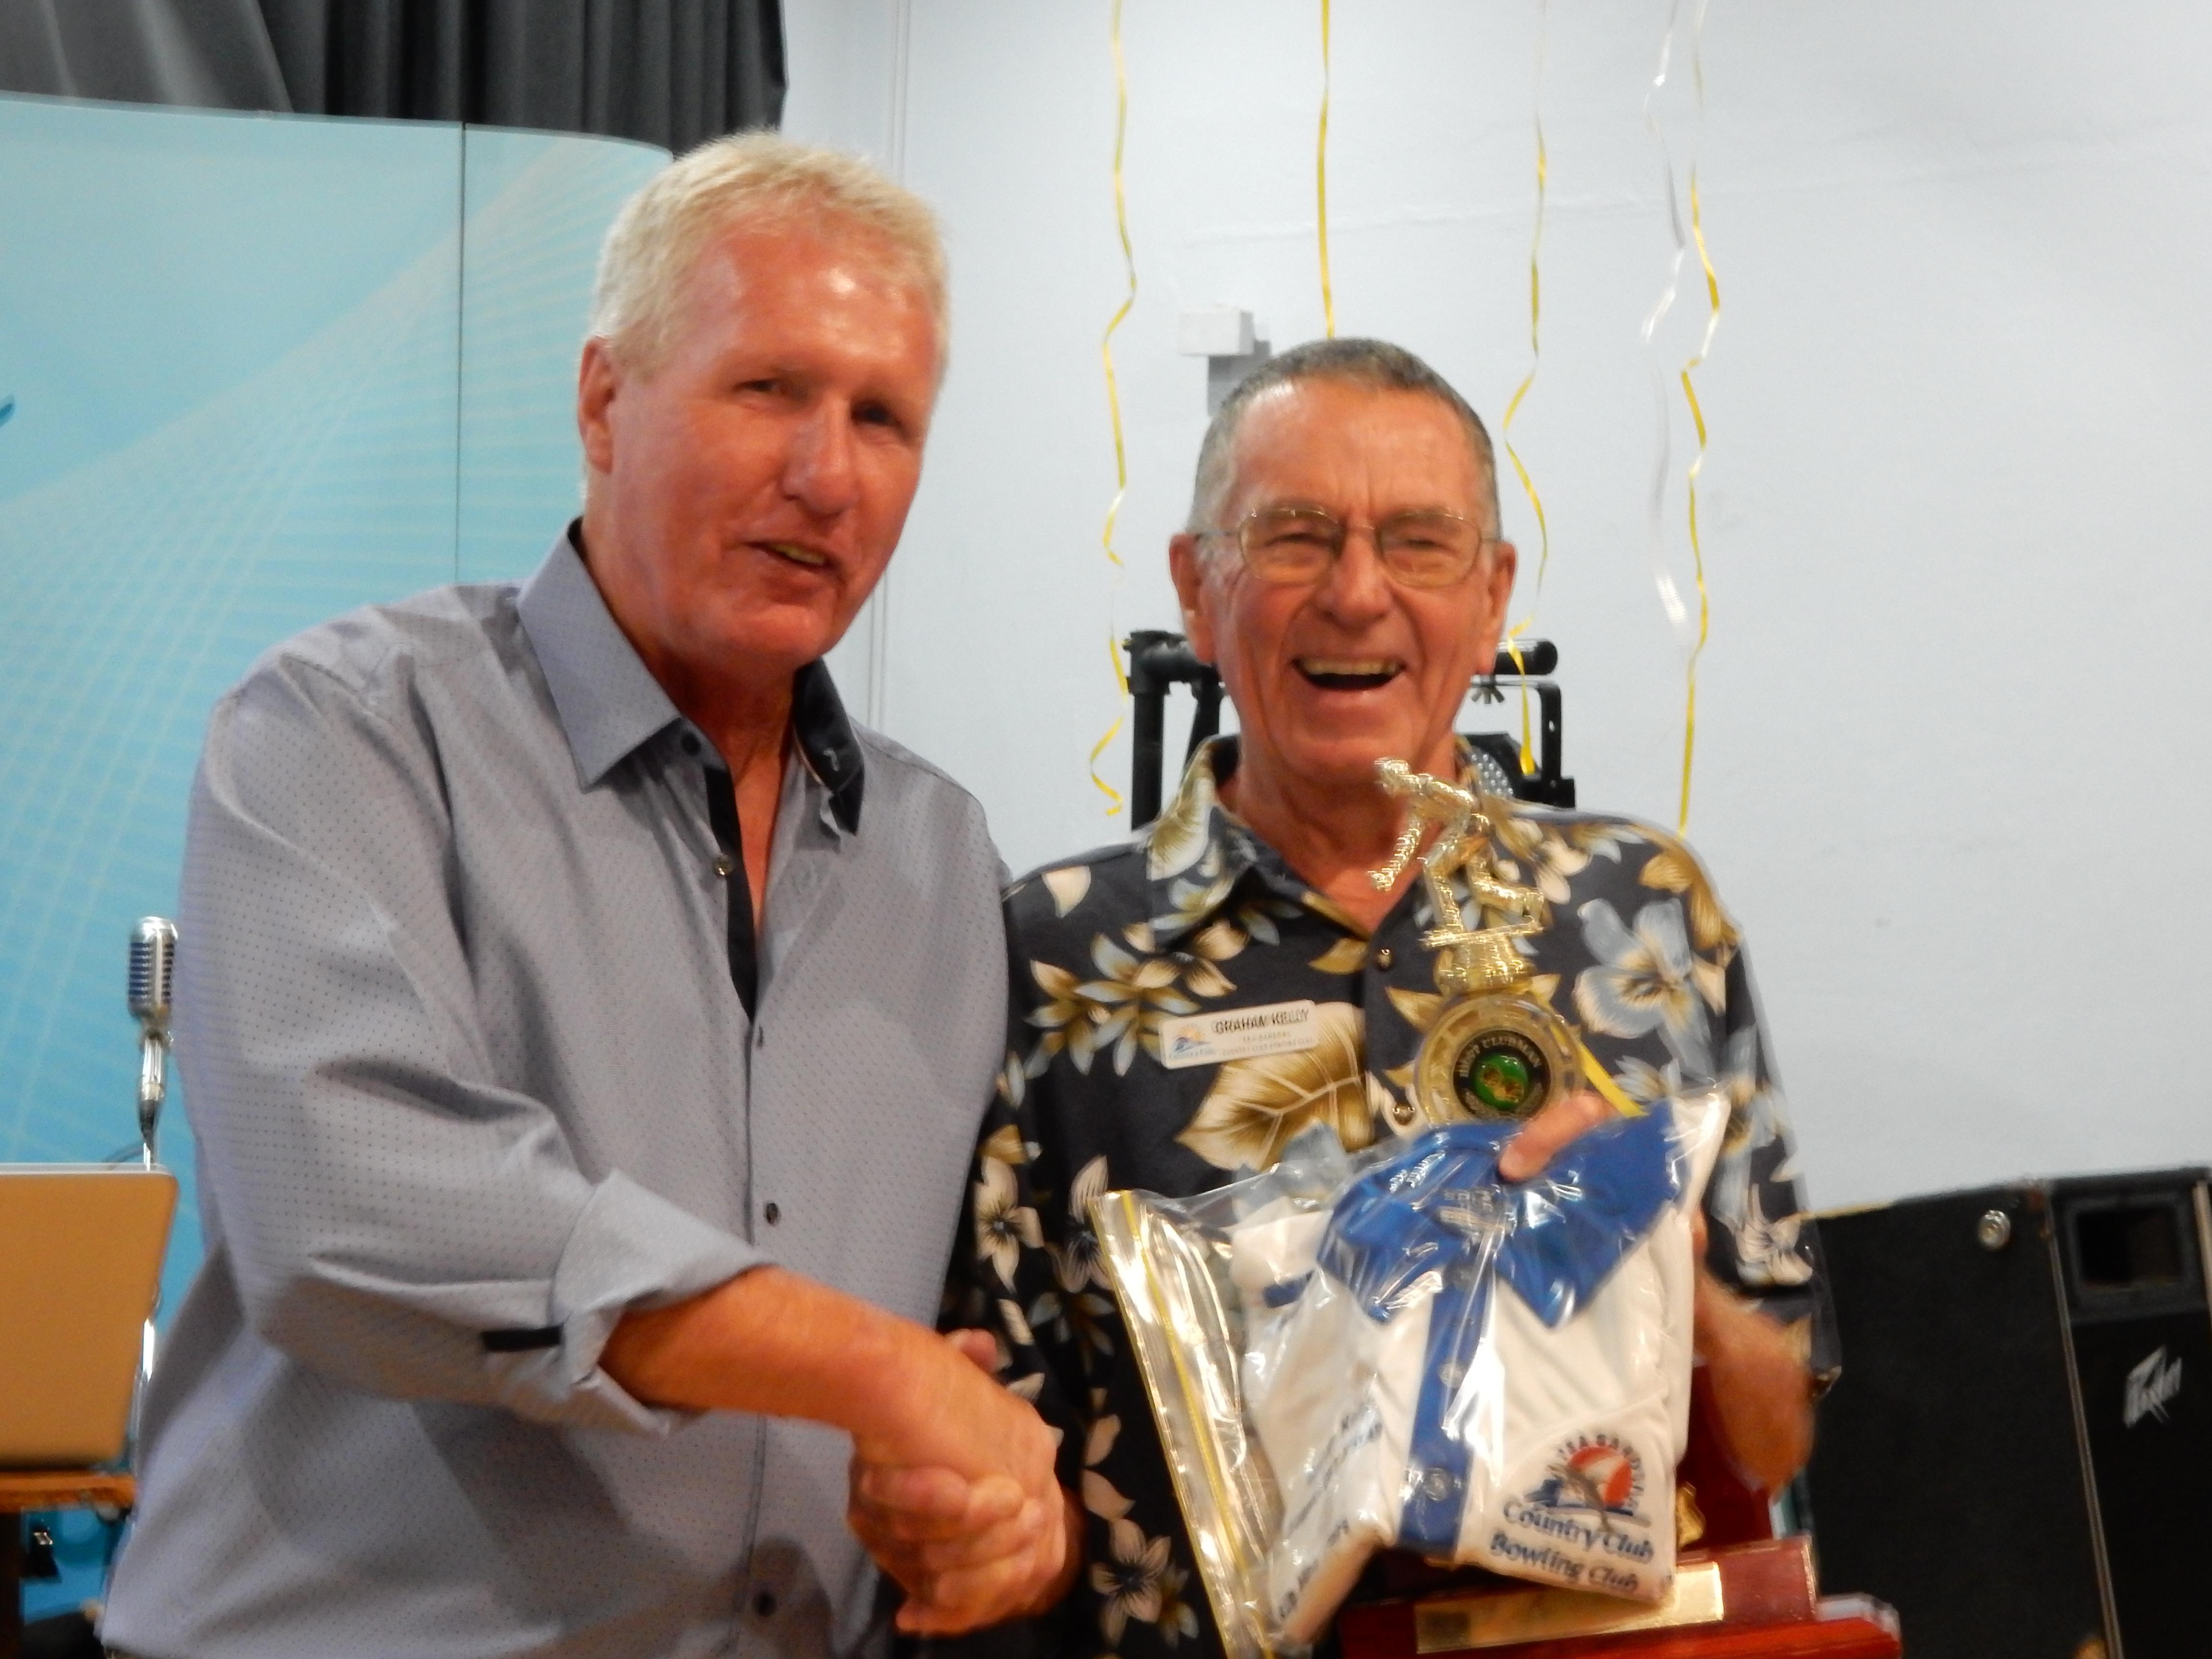 Club President Keith Smith awarding Club Treasurer Graham Kelly with the